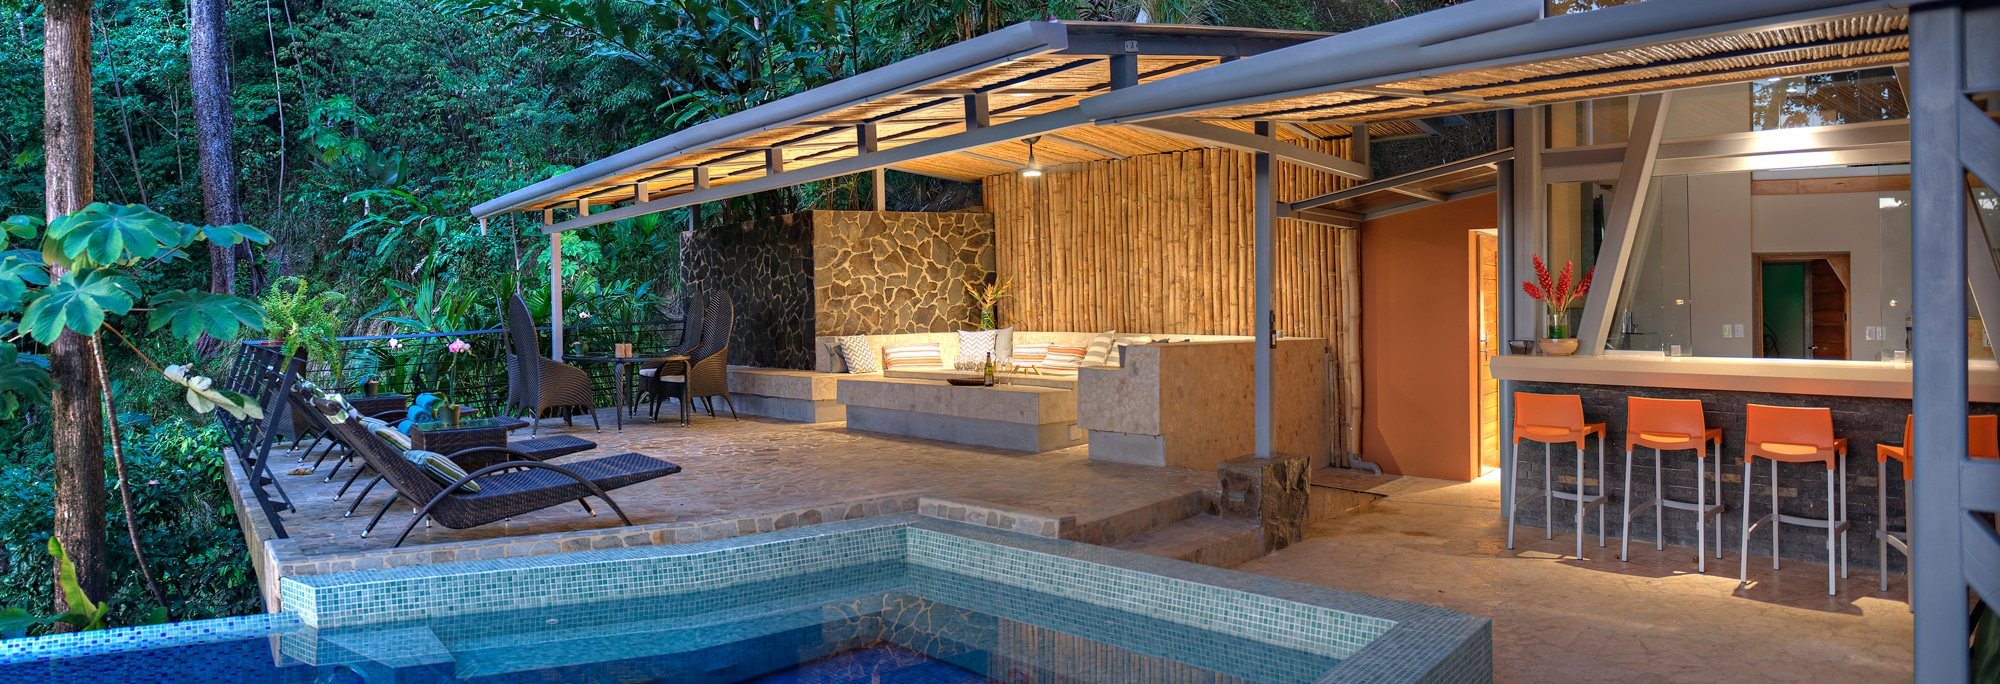 New Luxury Villa Pool Area